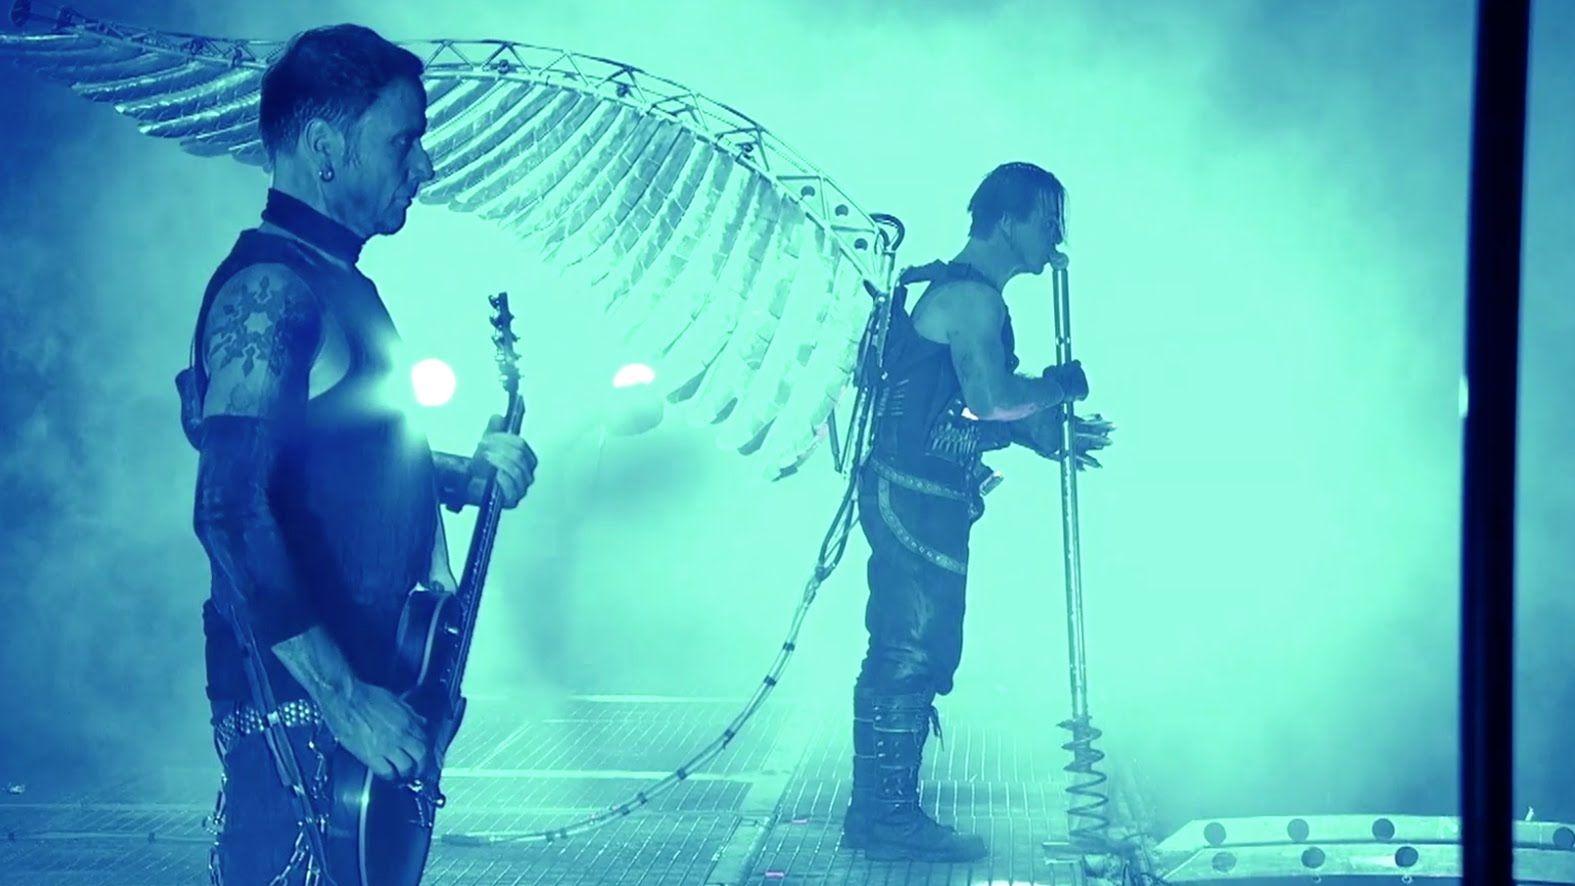 German Rock Band Rammstein - Preforming Engel (Live from